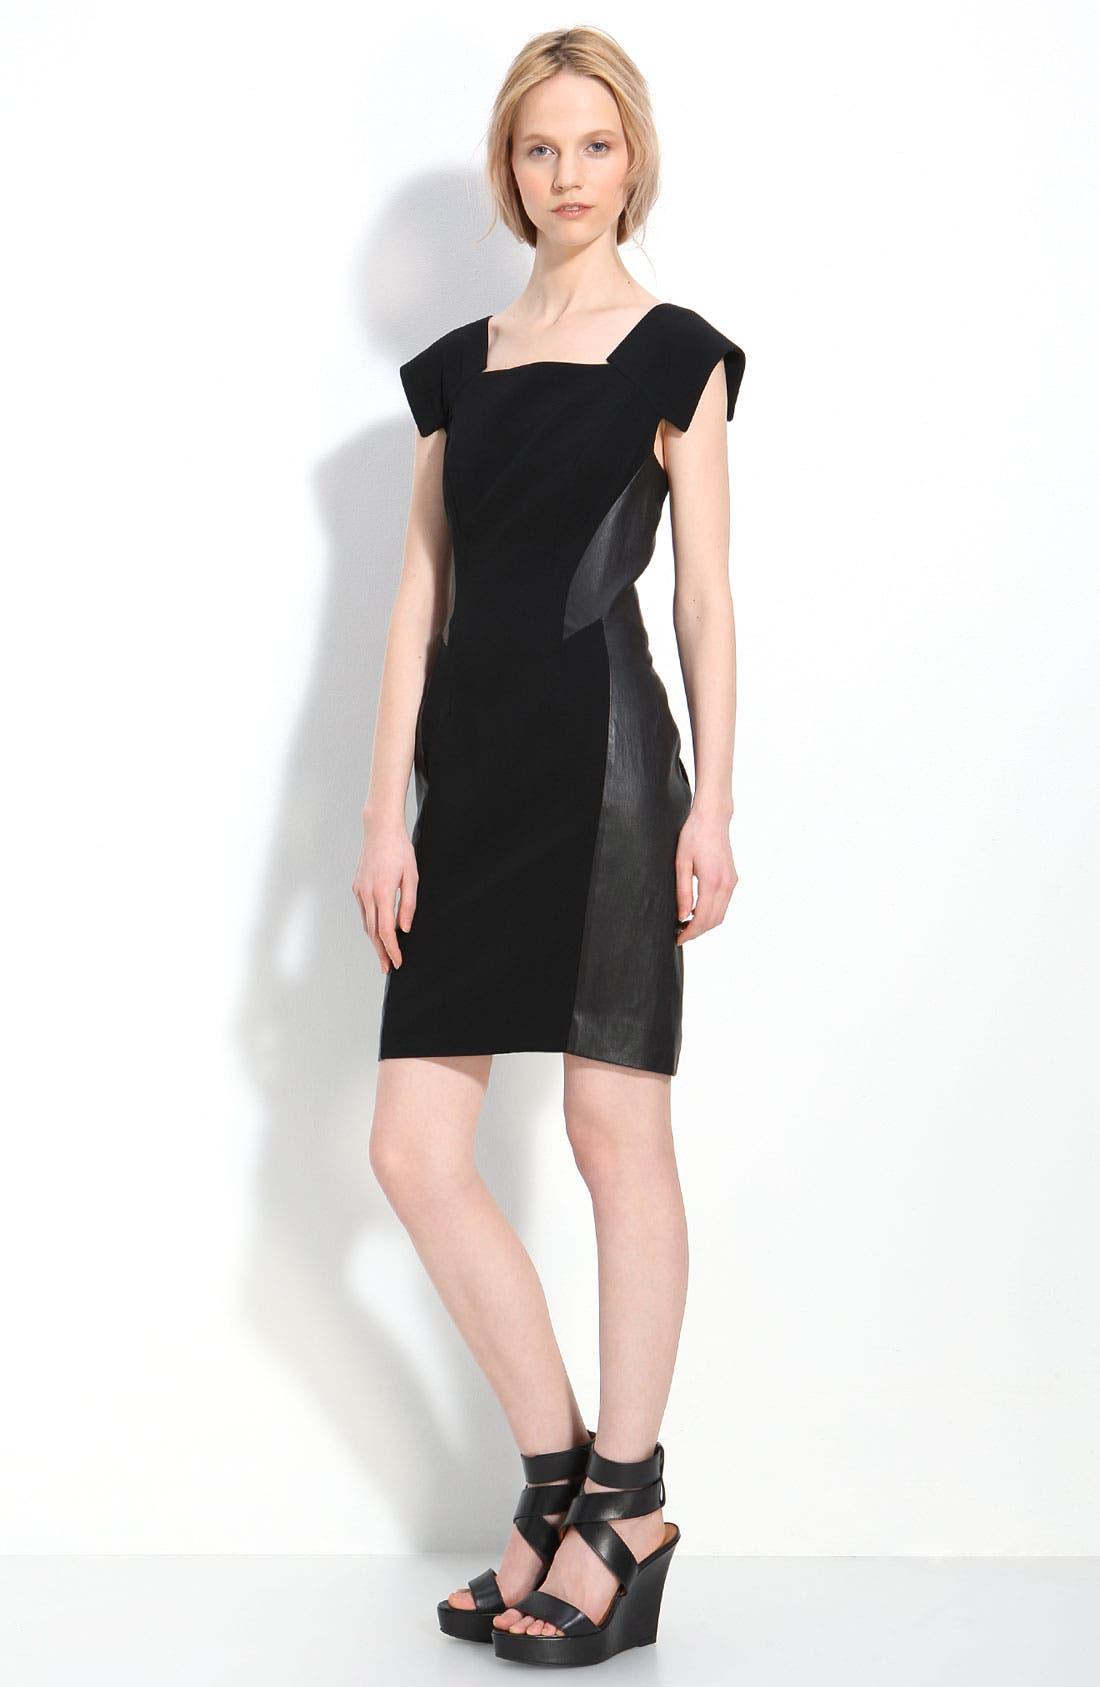 Main Image - rag & bone 'Surf' Leather Trim Dress